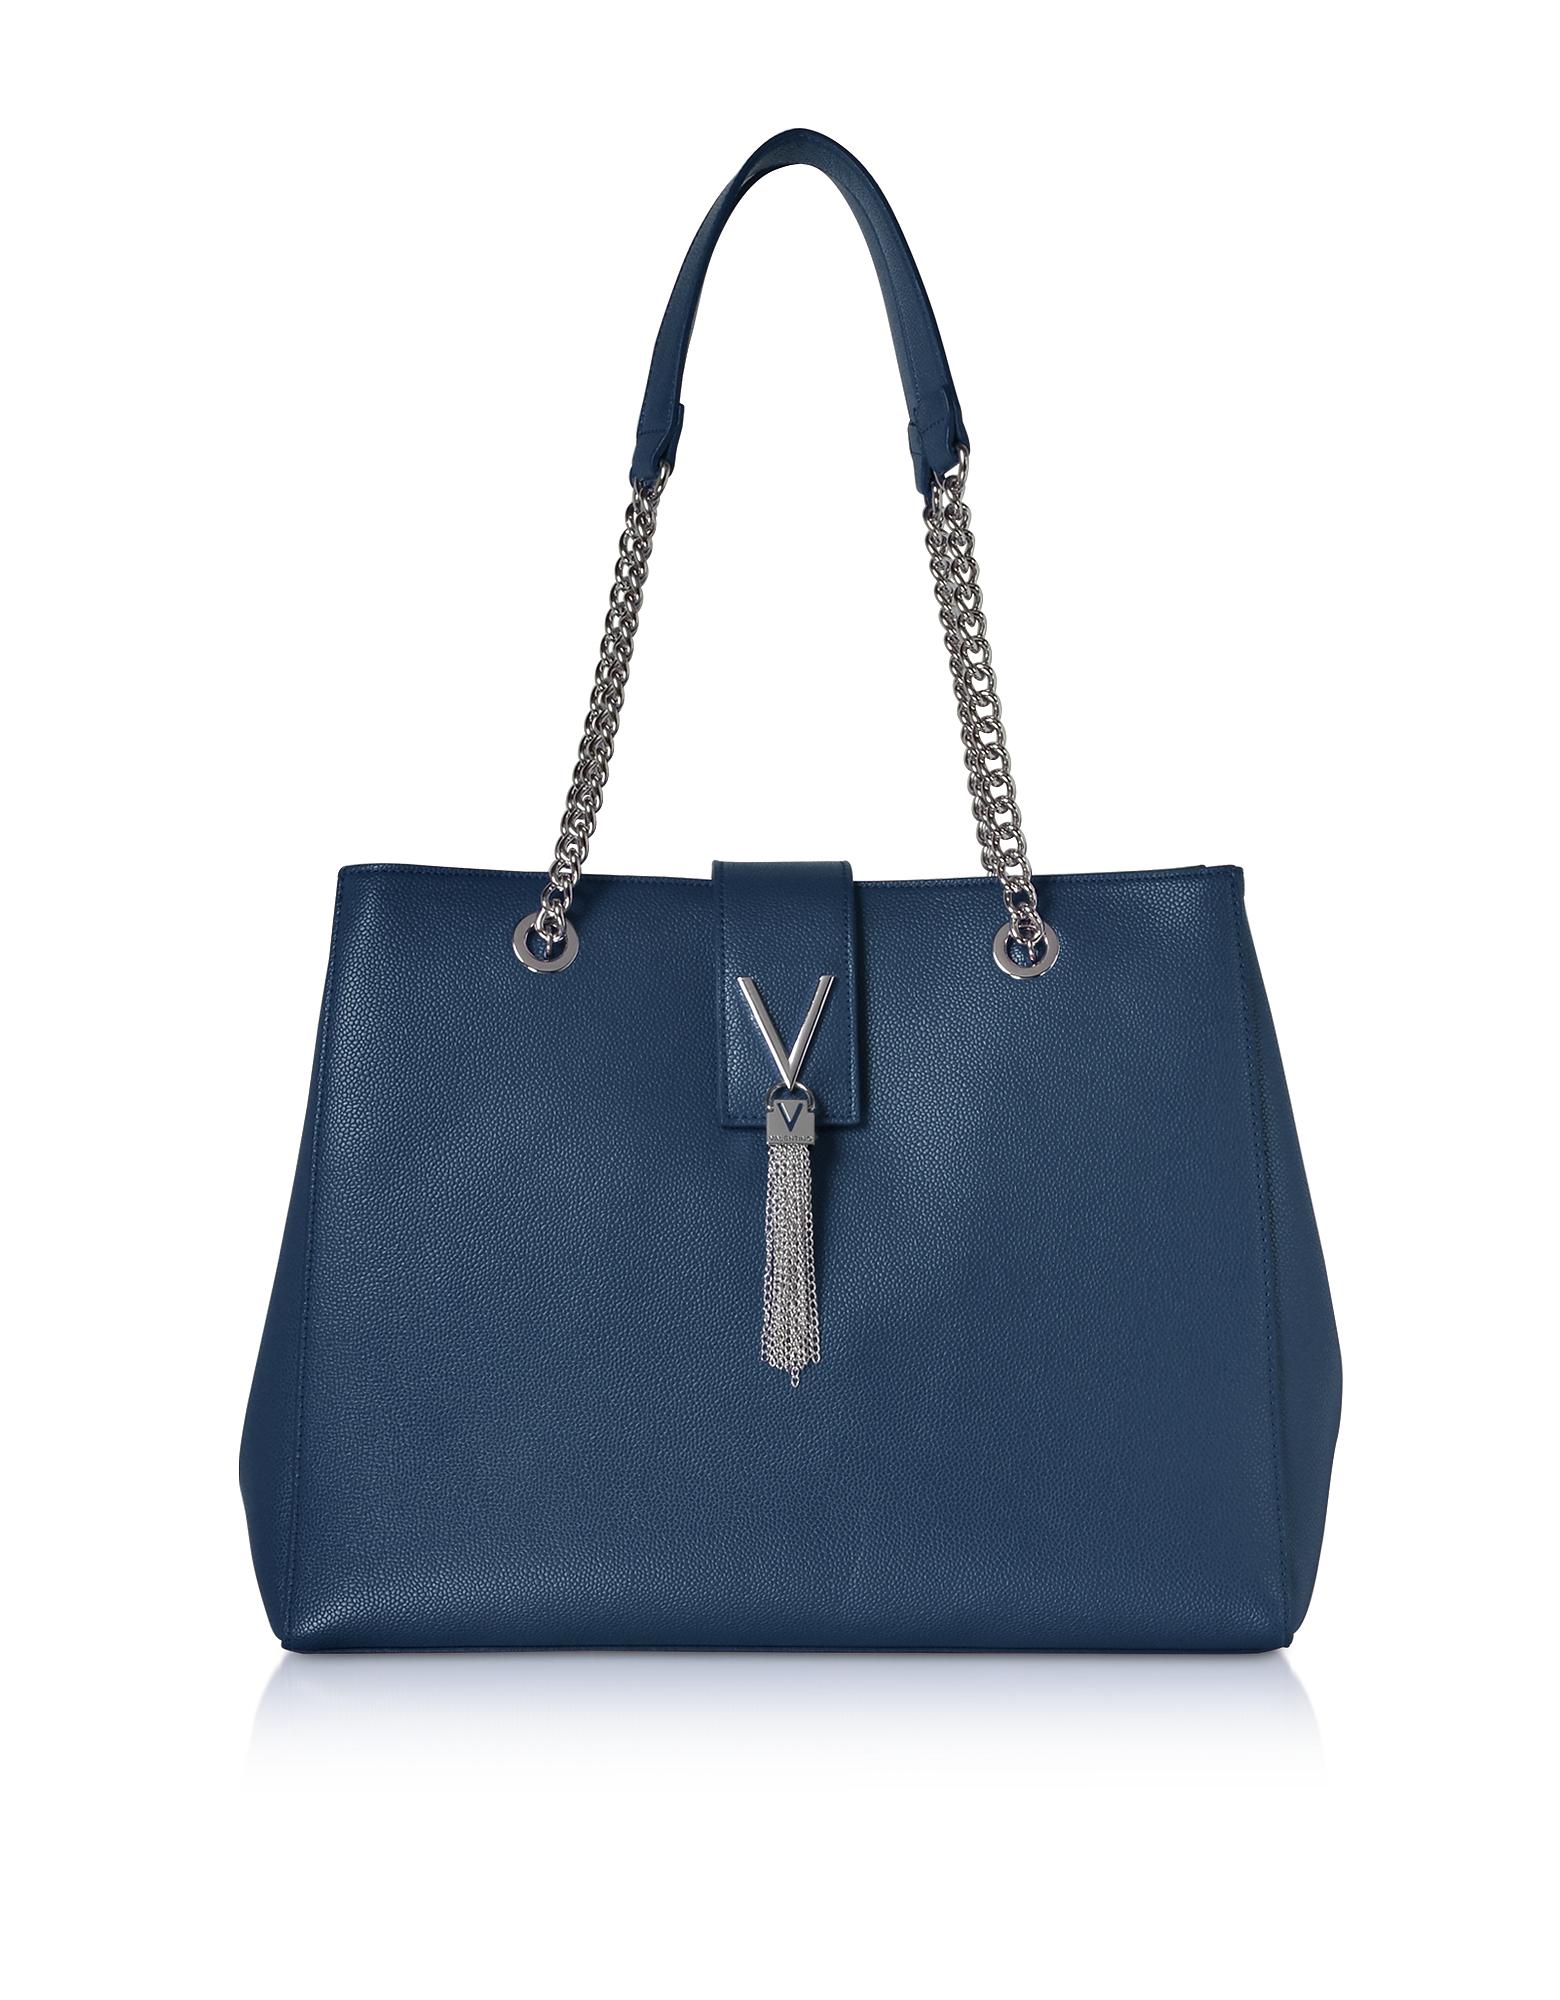 Valentino by Mario Valentino Handbags, Lizard Embossed Eco Leather Divina Tote Bag